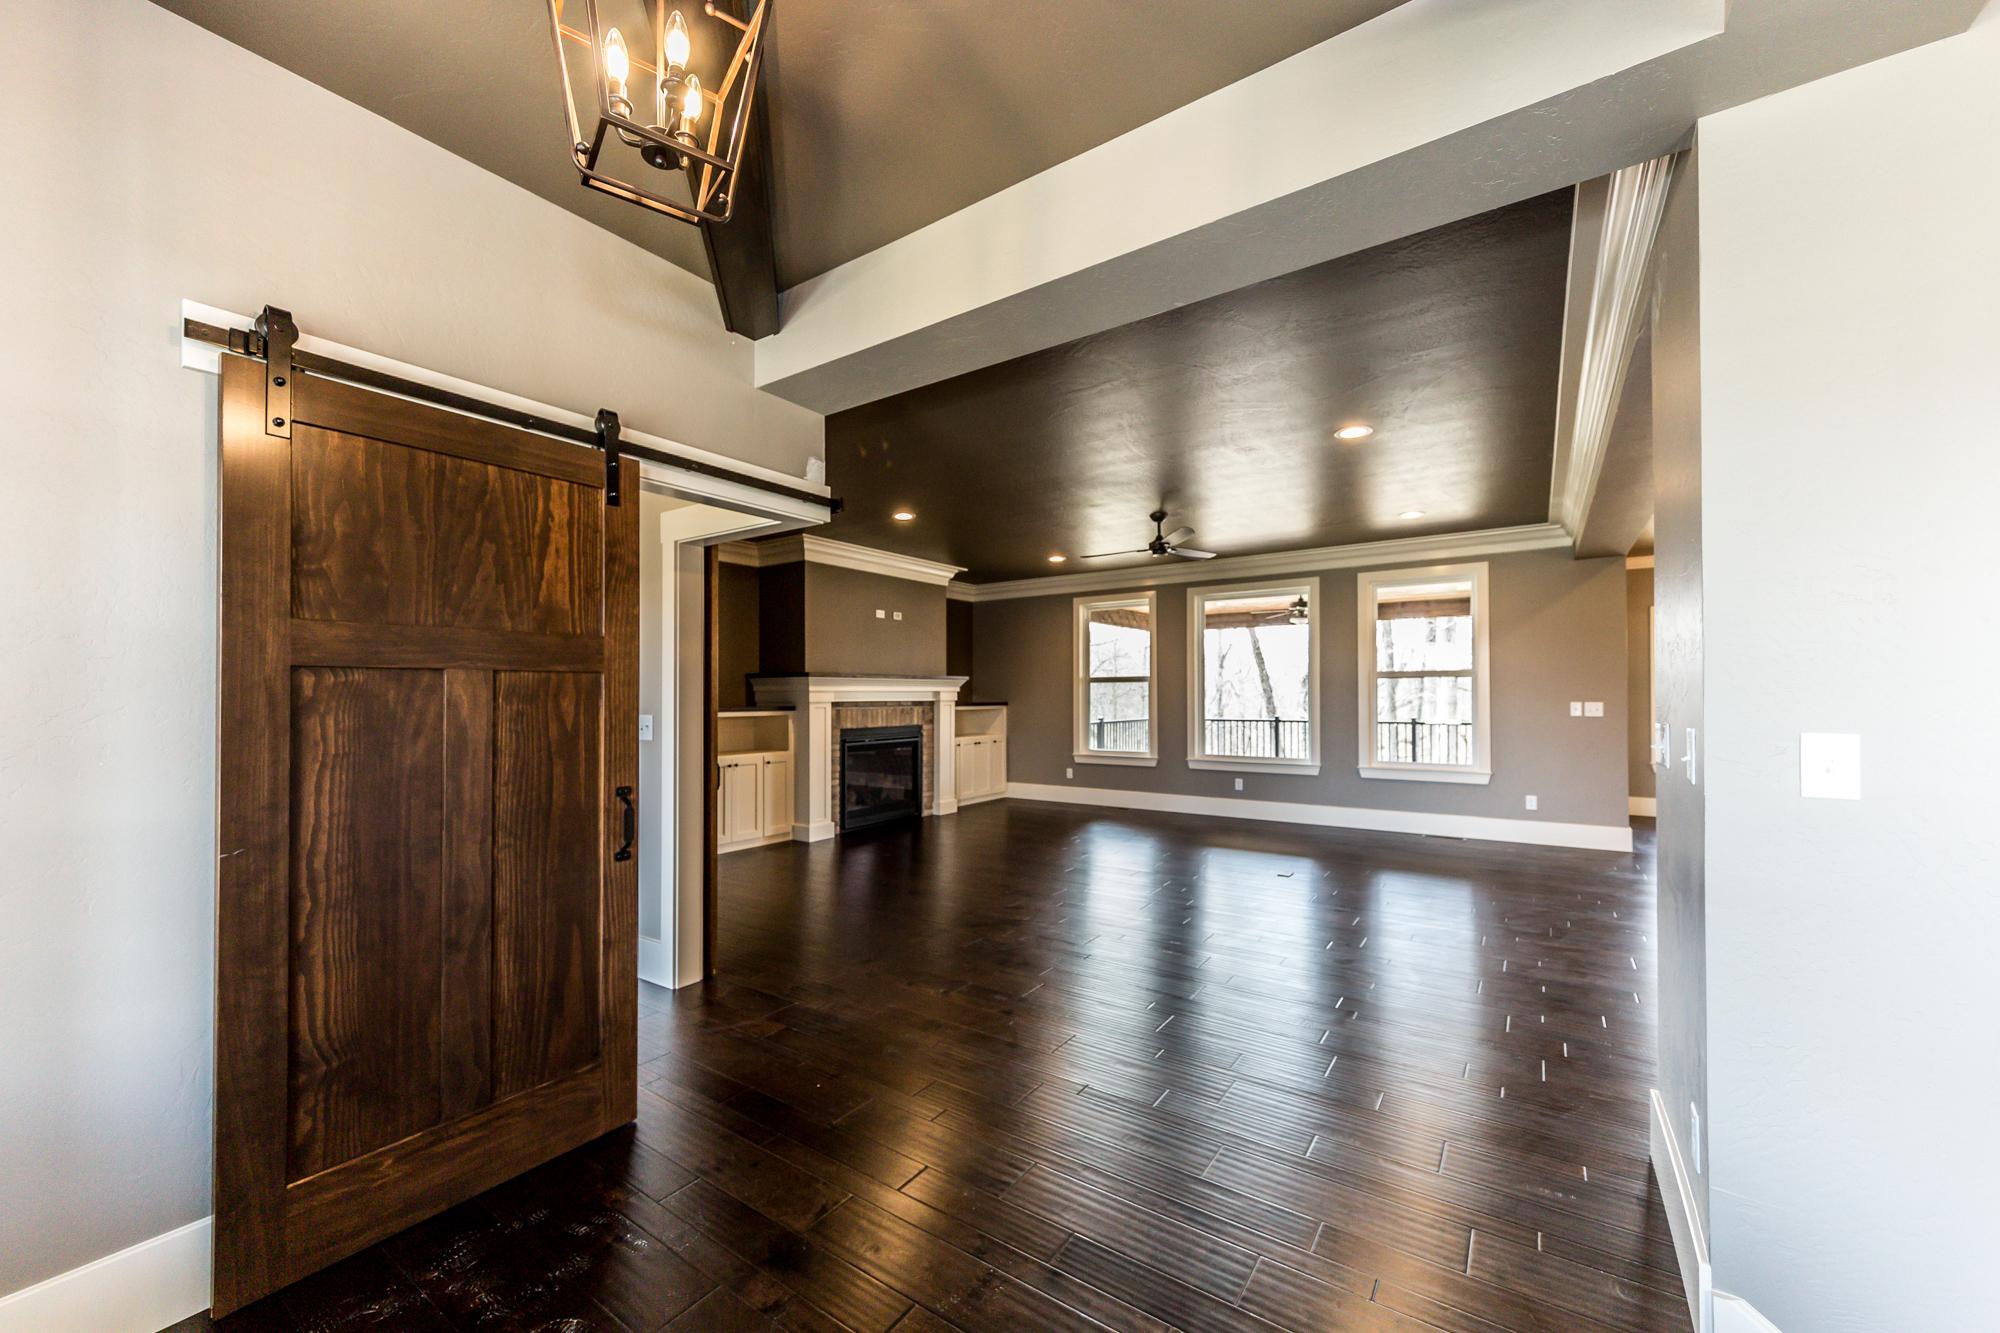 New-Construction-For-Sale-Bethel-Ridge-Farms-Scott-AFB-Illinois-2.jpg